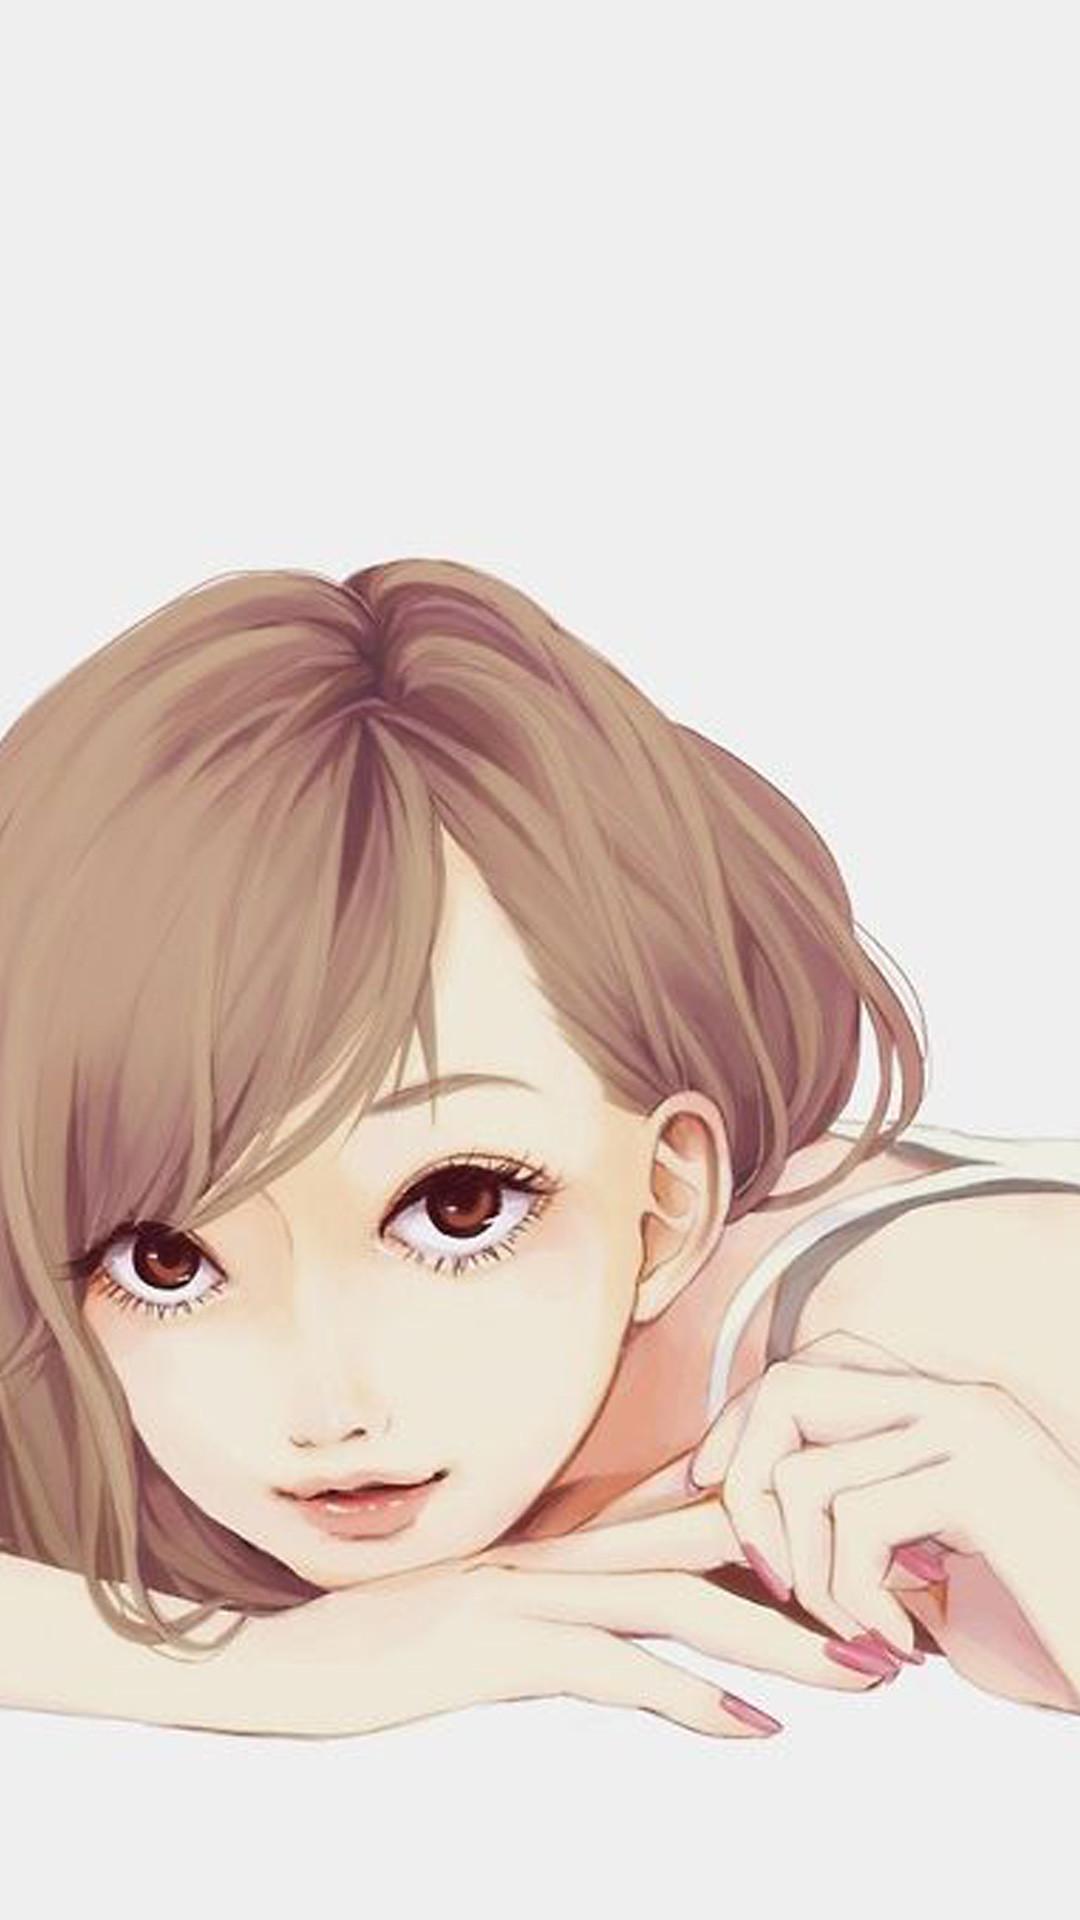 Iphone 6 wallpaper tumblr girl - 1080x1920 Iphone 7 Plus